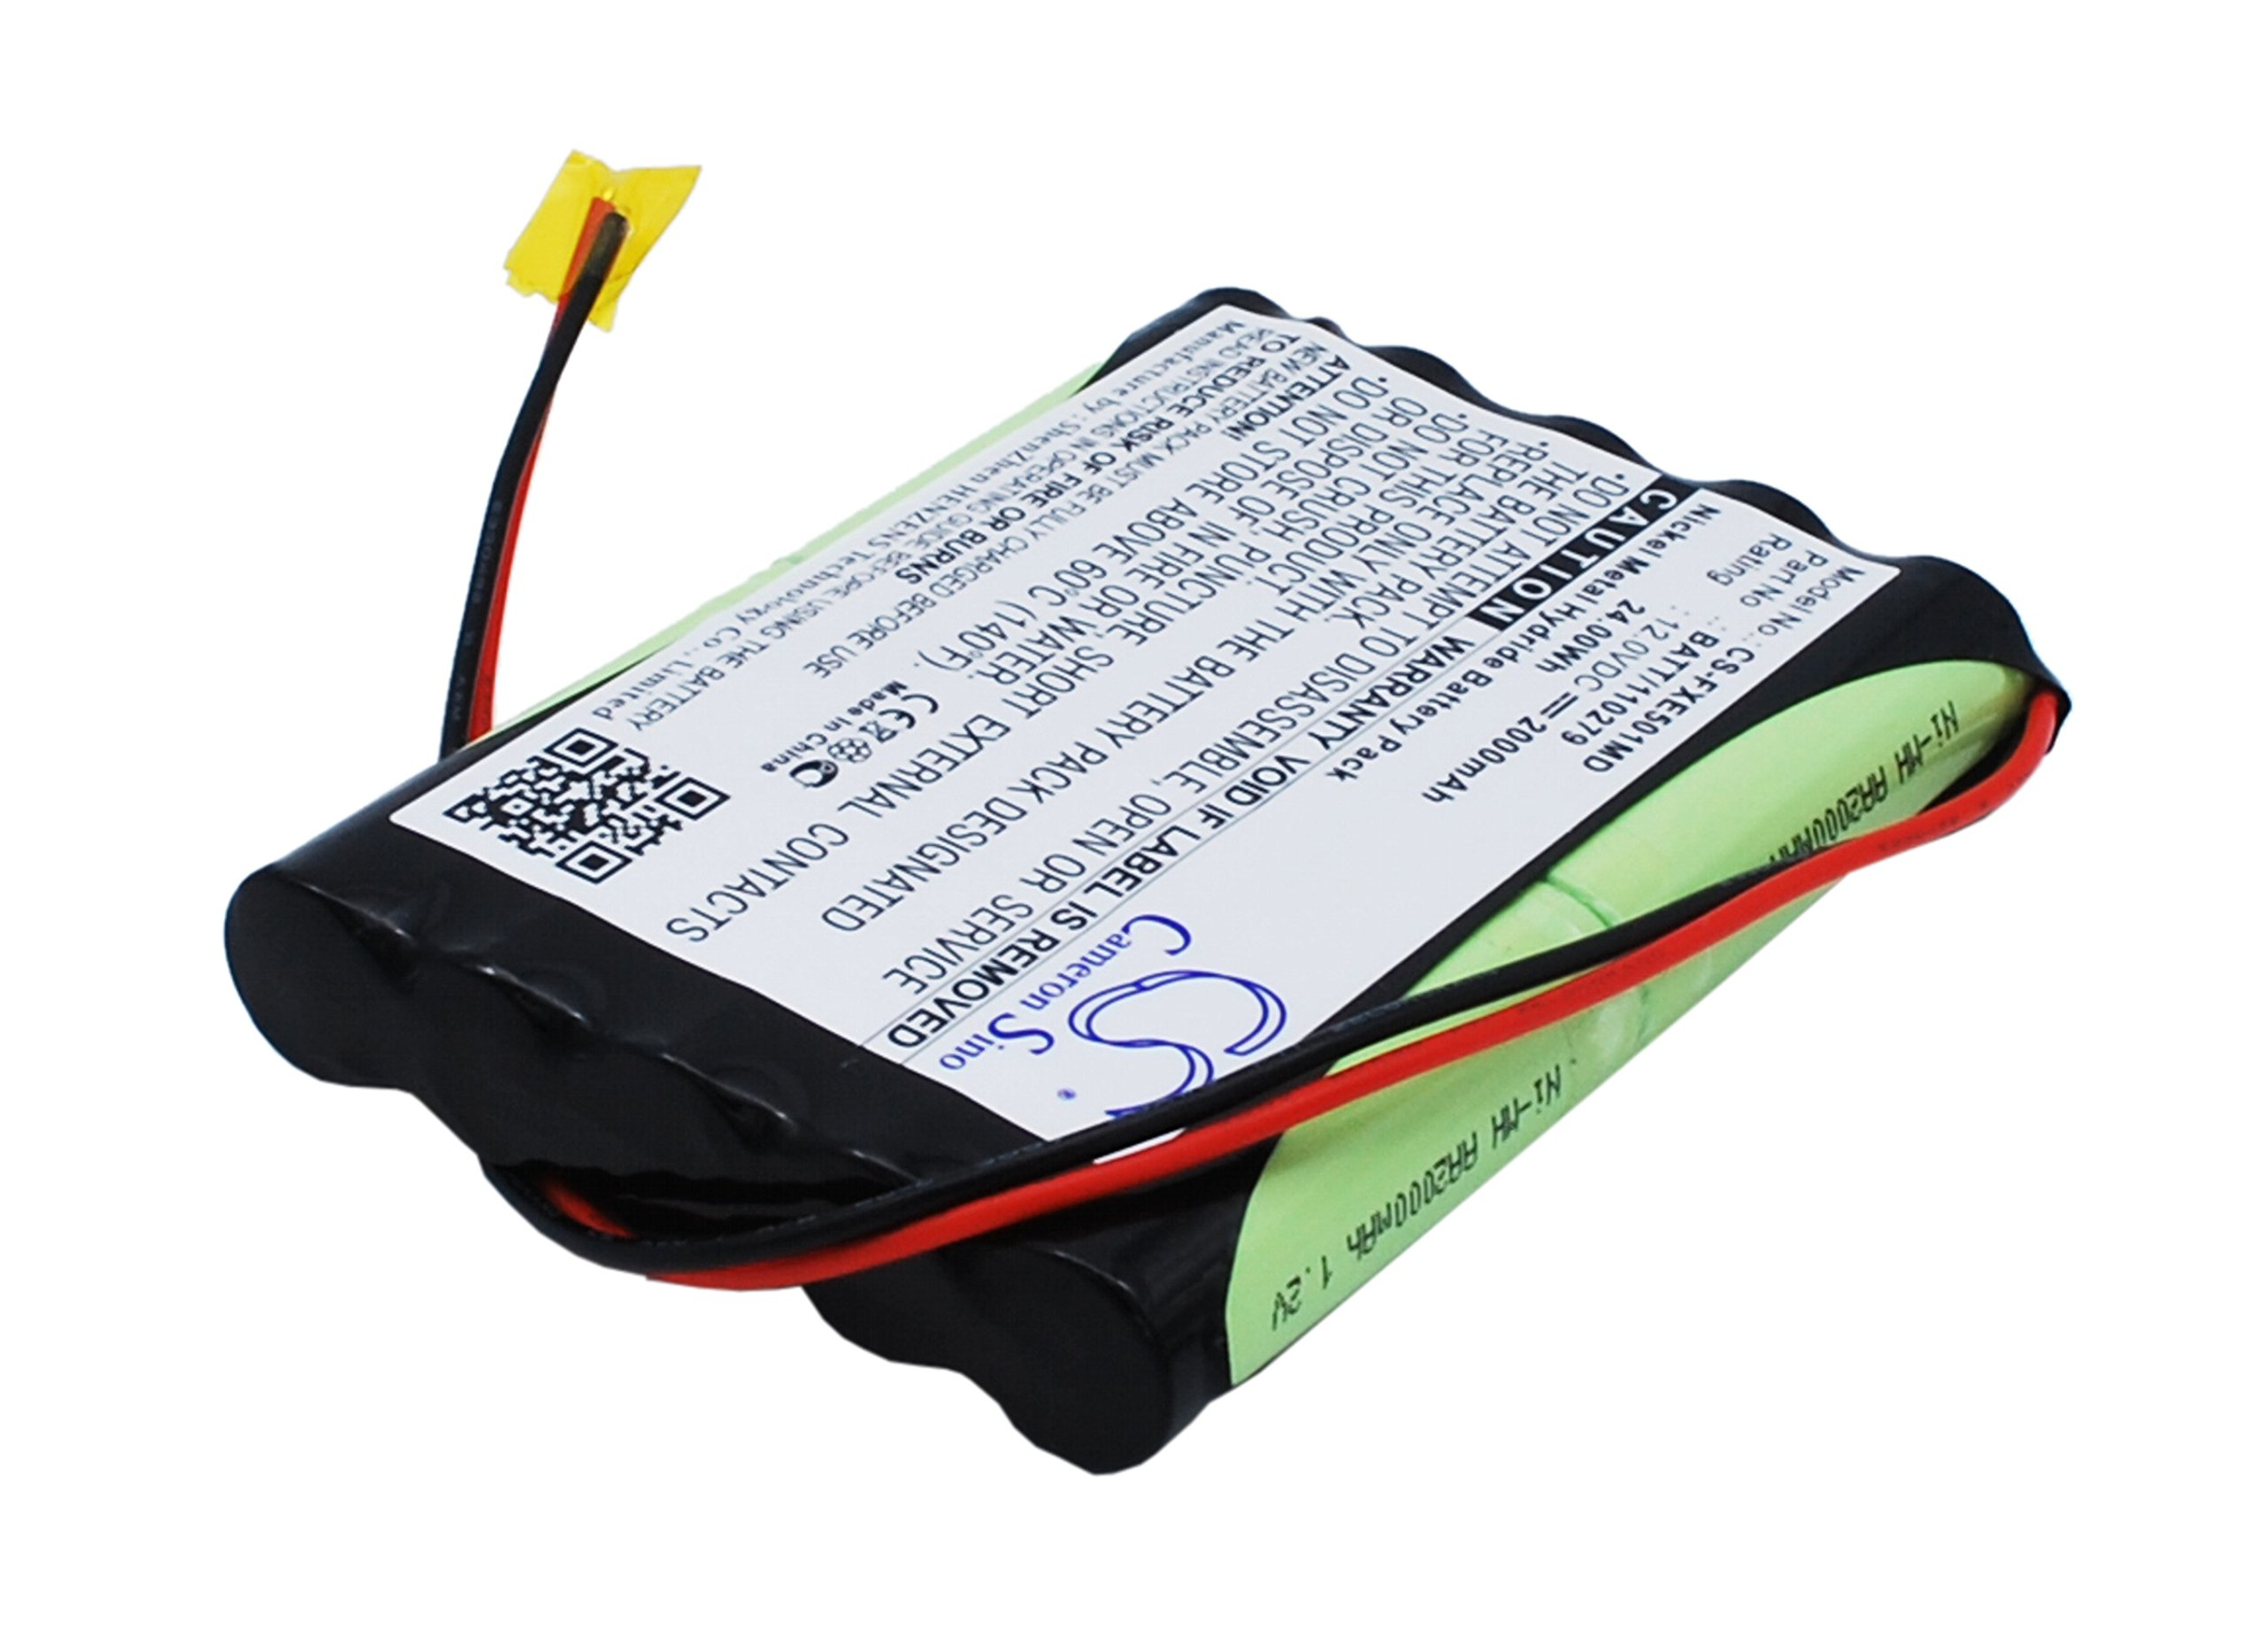 C & S 2000mAh 120279, BATT/110279 Battery FUKUDA Cardisuny ME501BX ECG Analyzer